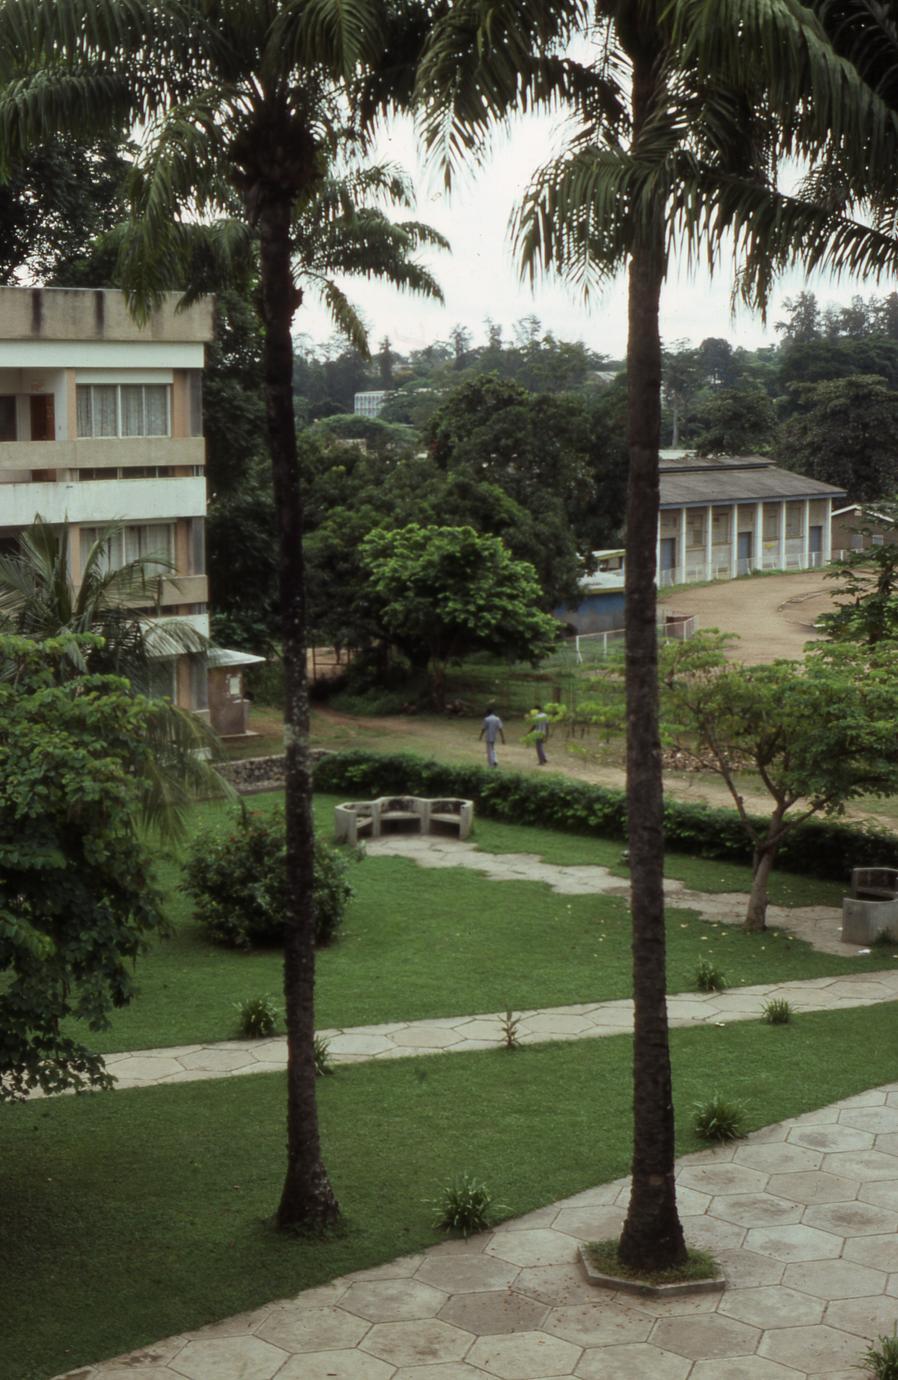 University of Ibadan Social Science building